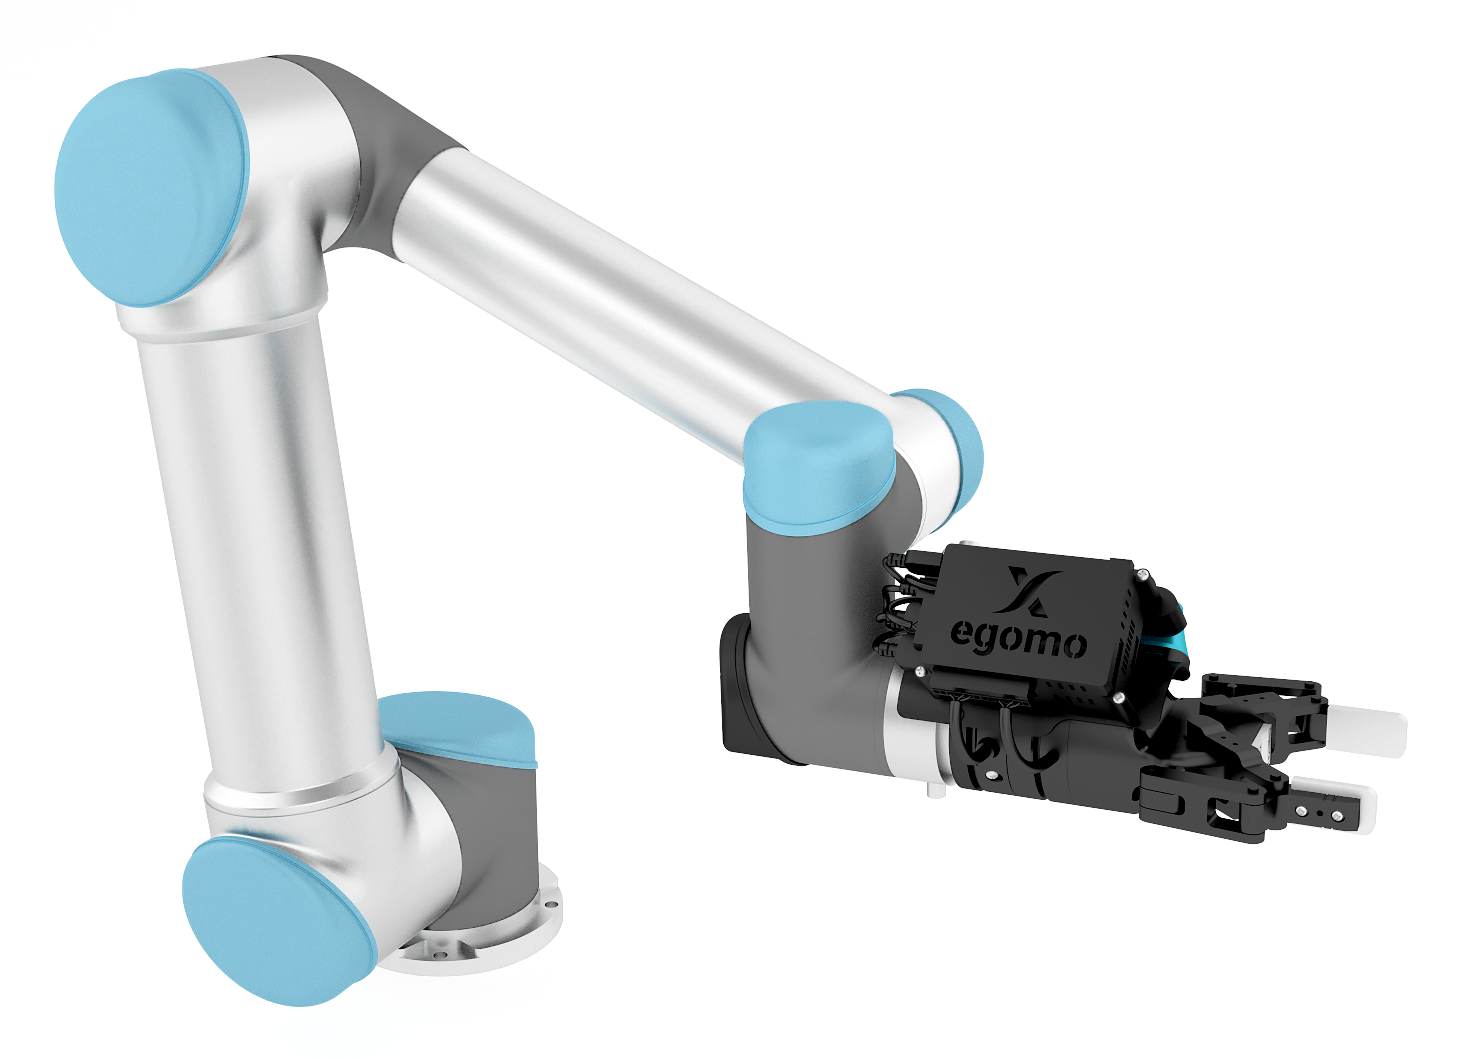 Xamla Egomo Sensorhead for UR5 + Robotiq FT-Sensor & Gripper — DoF